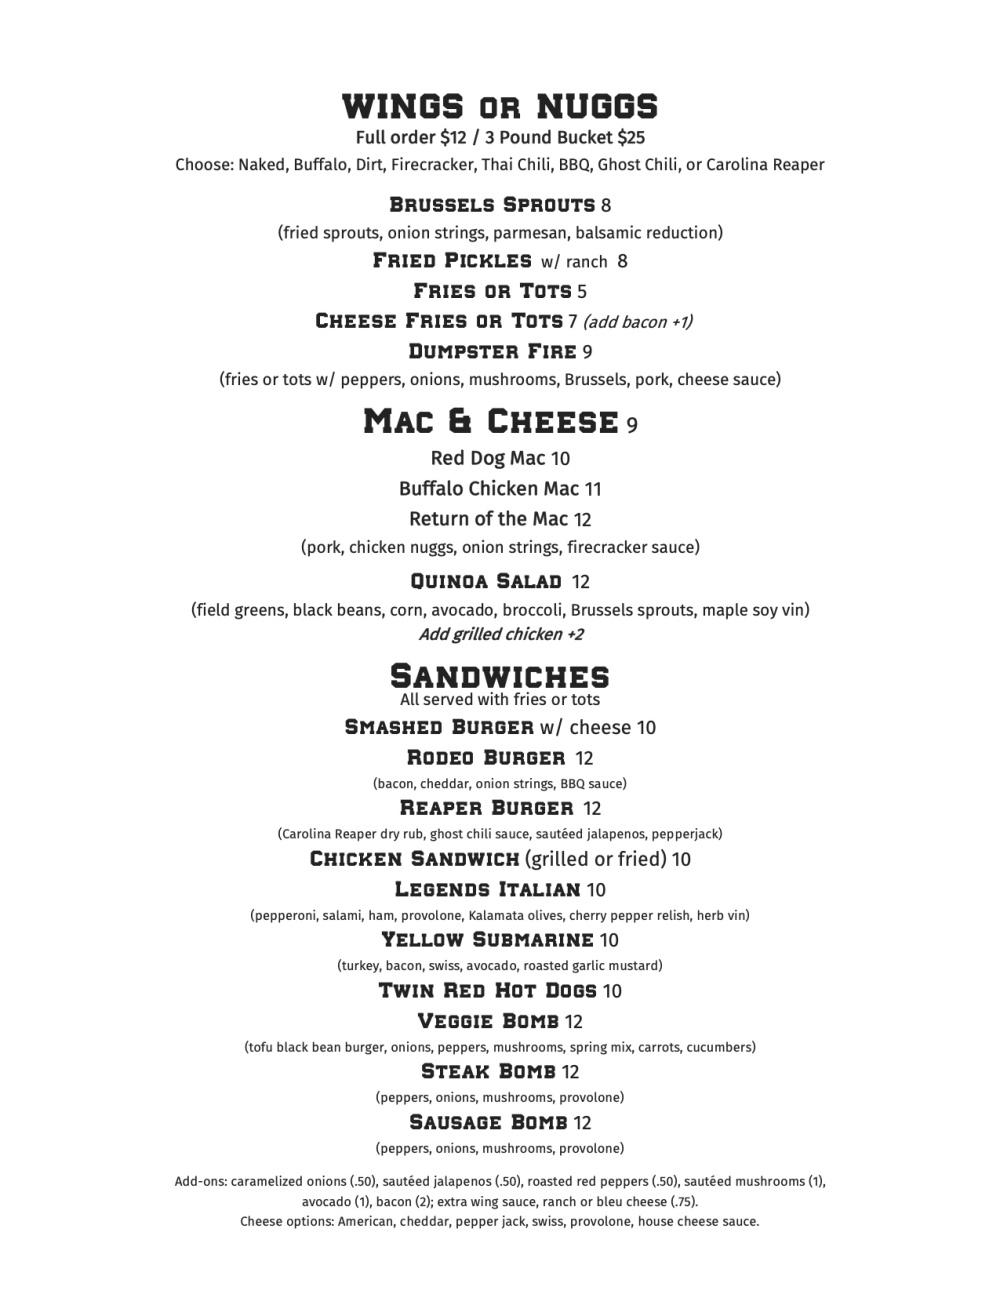 LEGENDS releaunch menu